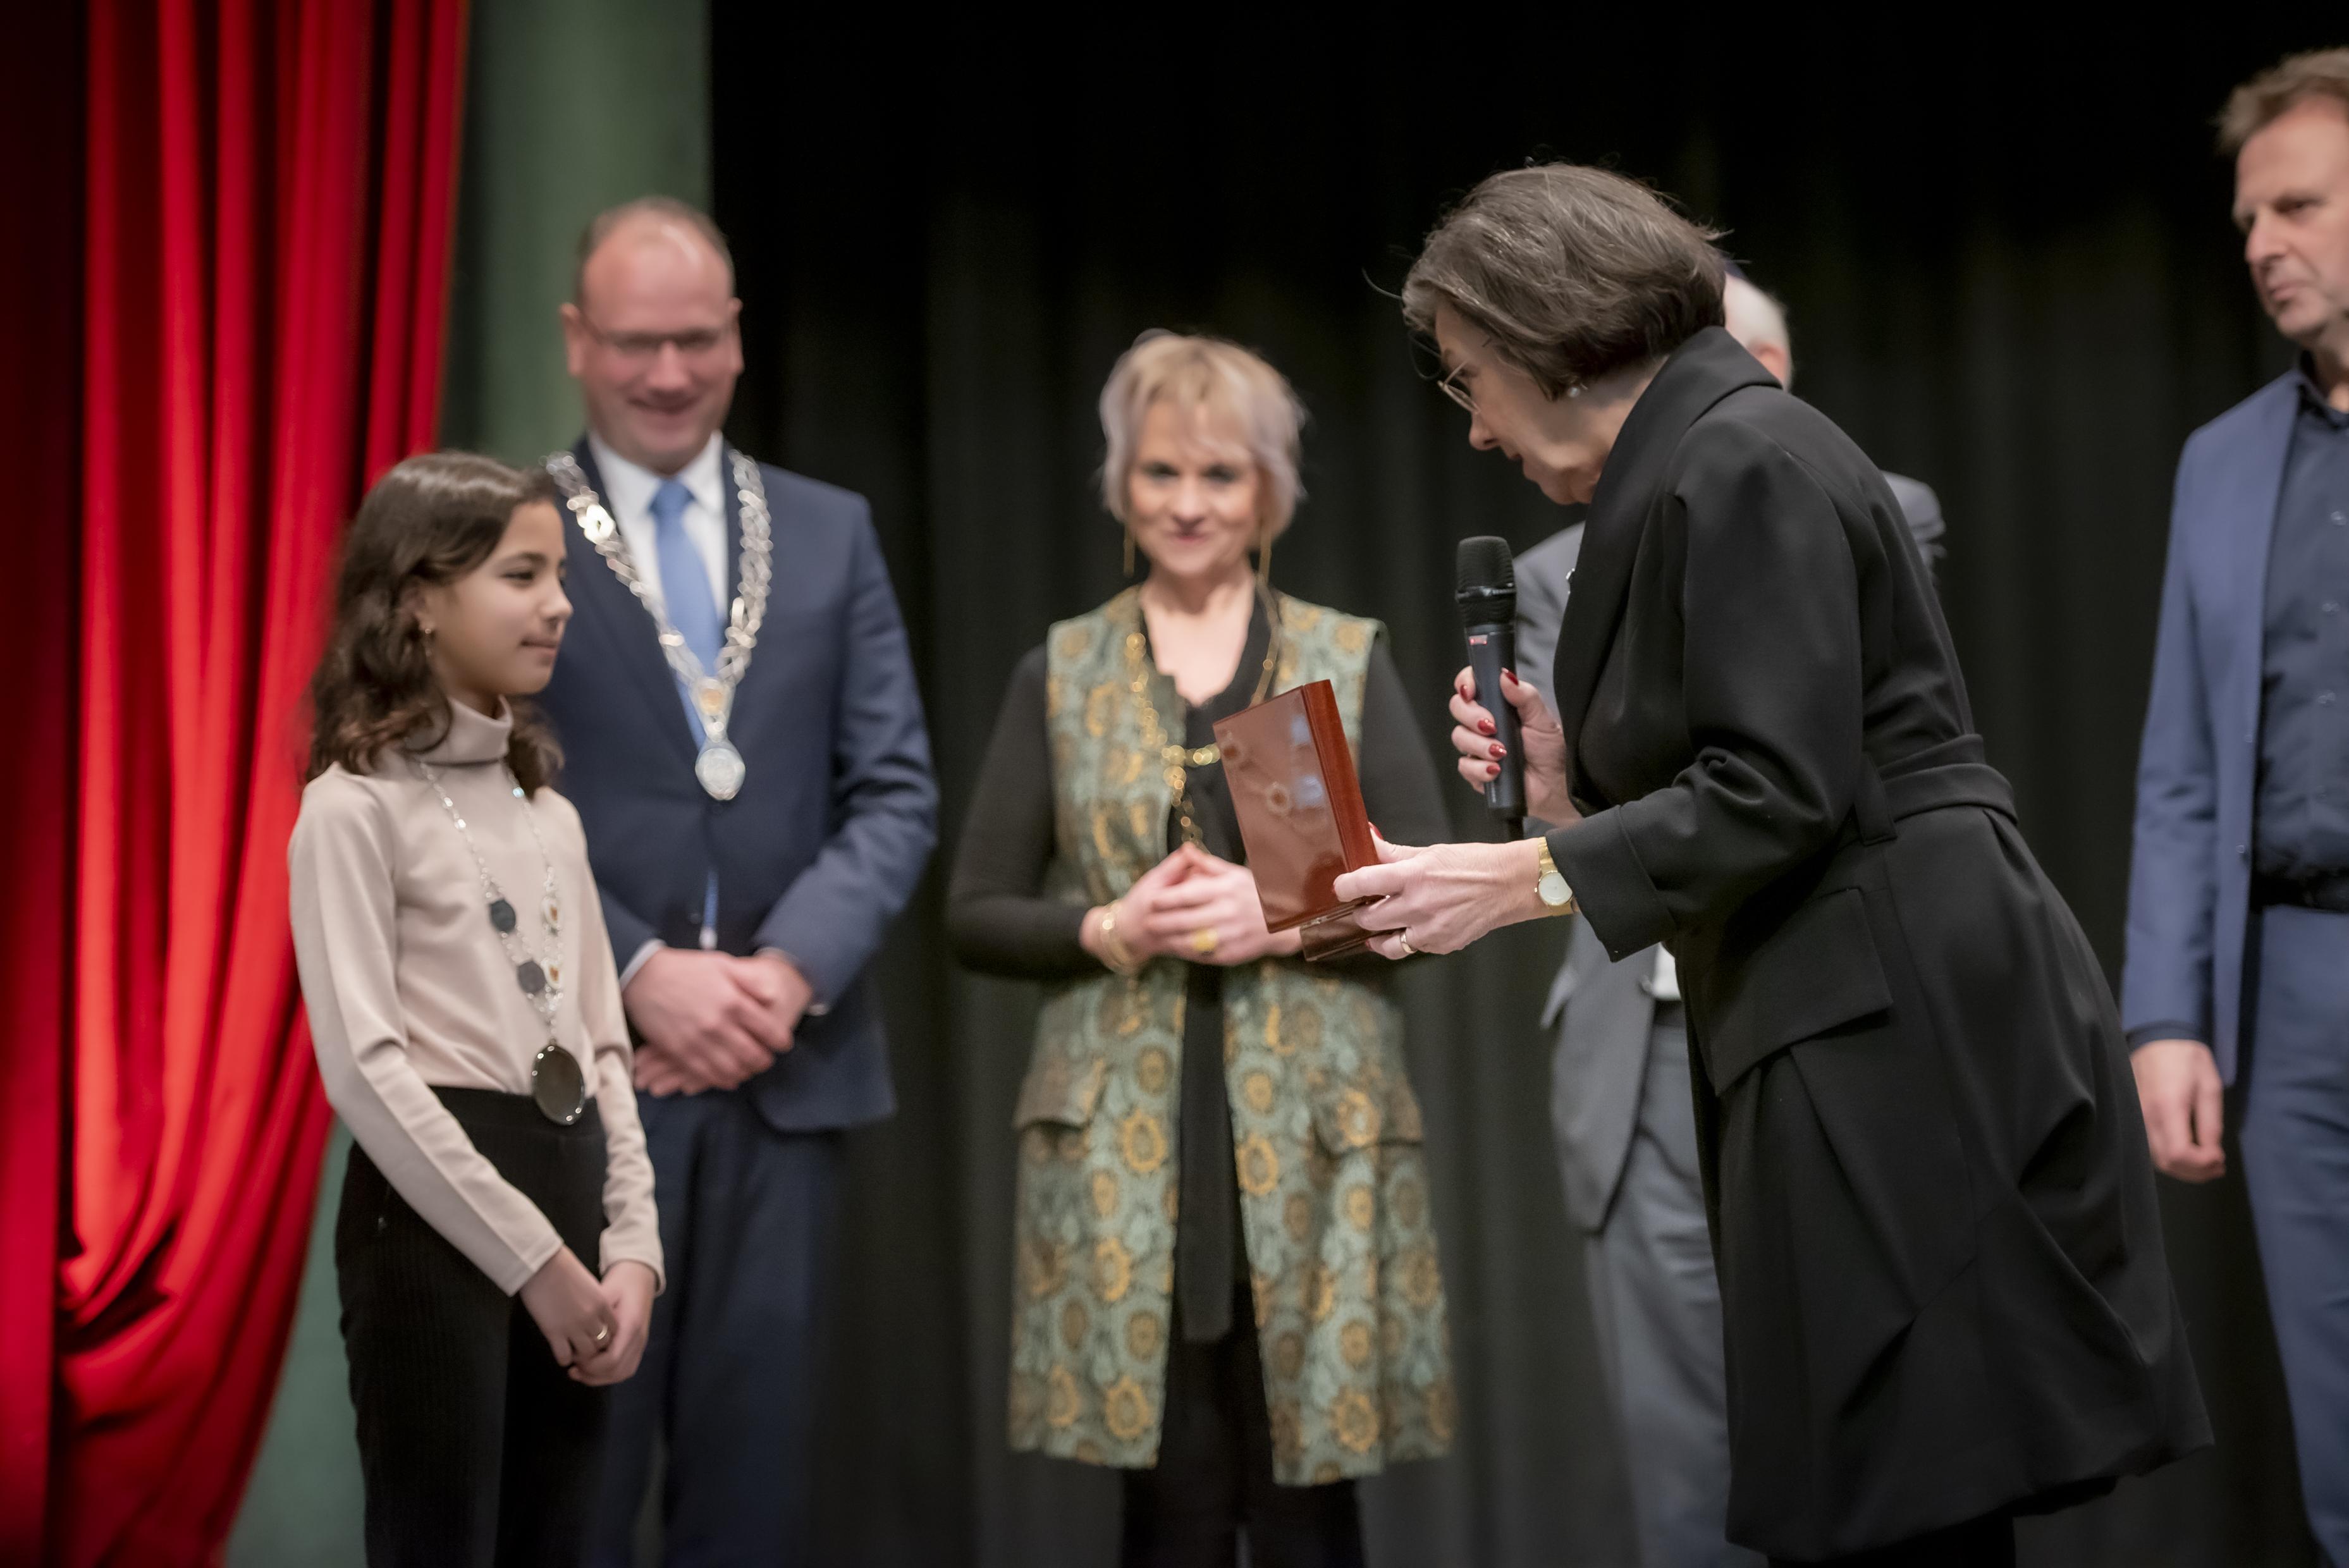 Herinneringscentrum Apeldoornsche Bosch geopend